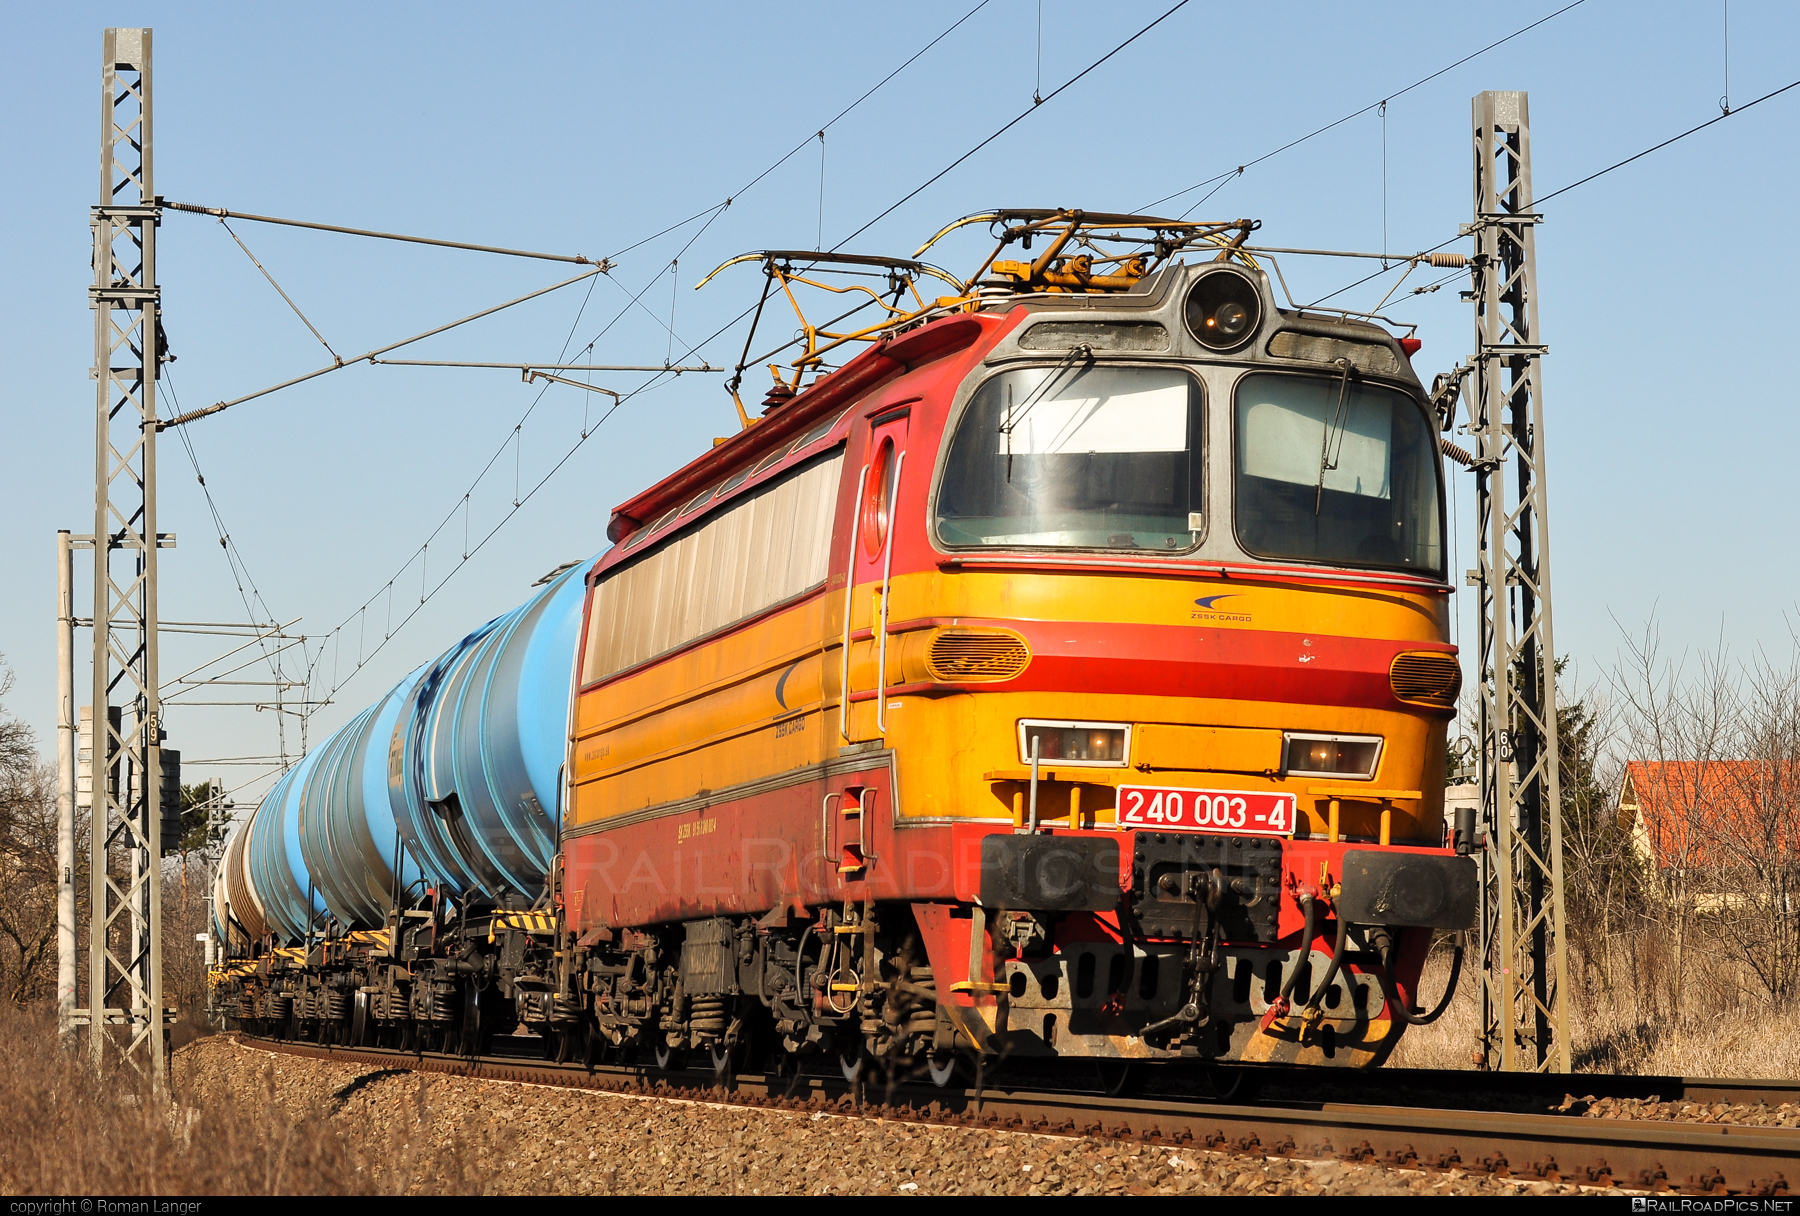 Škoda 47E - 240 003-4 operated by Železničná Spoločnost' Cargo Slovakia a.s. #ZeleznicnaSpolocnostCargoSlovakia #kesselwagen #laminatka #locomotive240 #skoda #skoda47e #tankwagon #zsskcargo